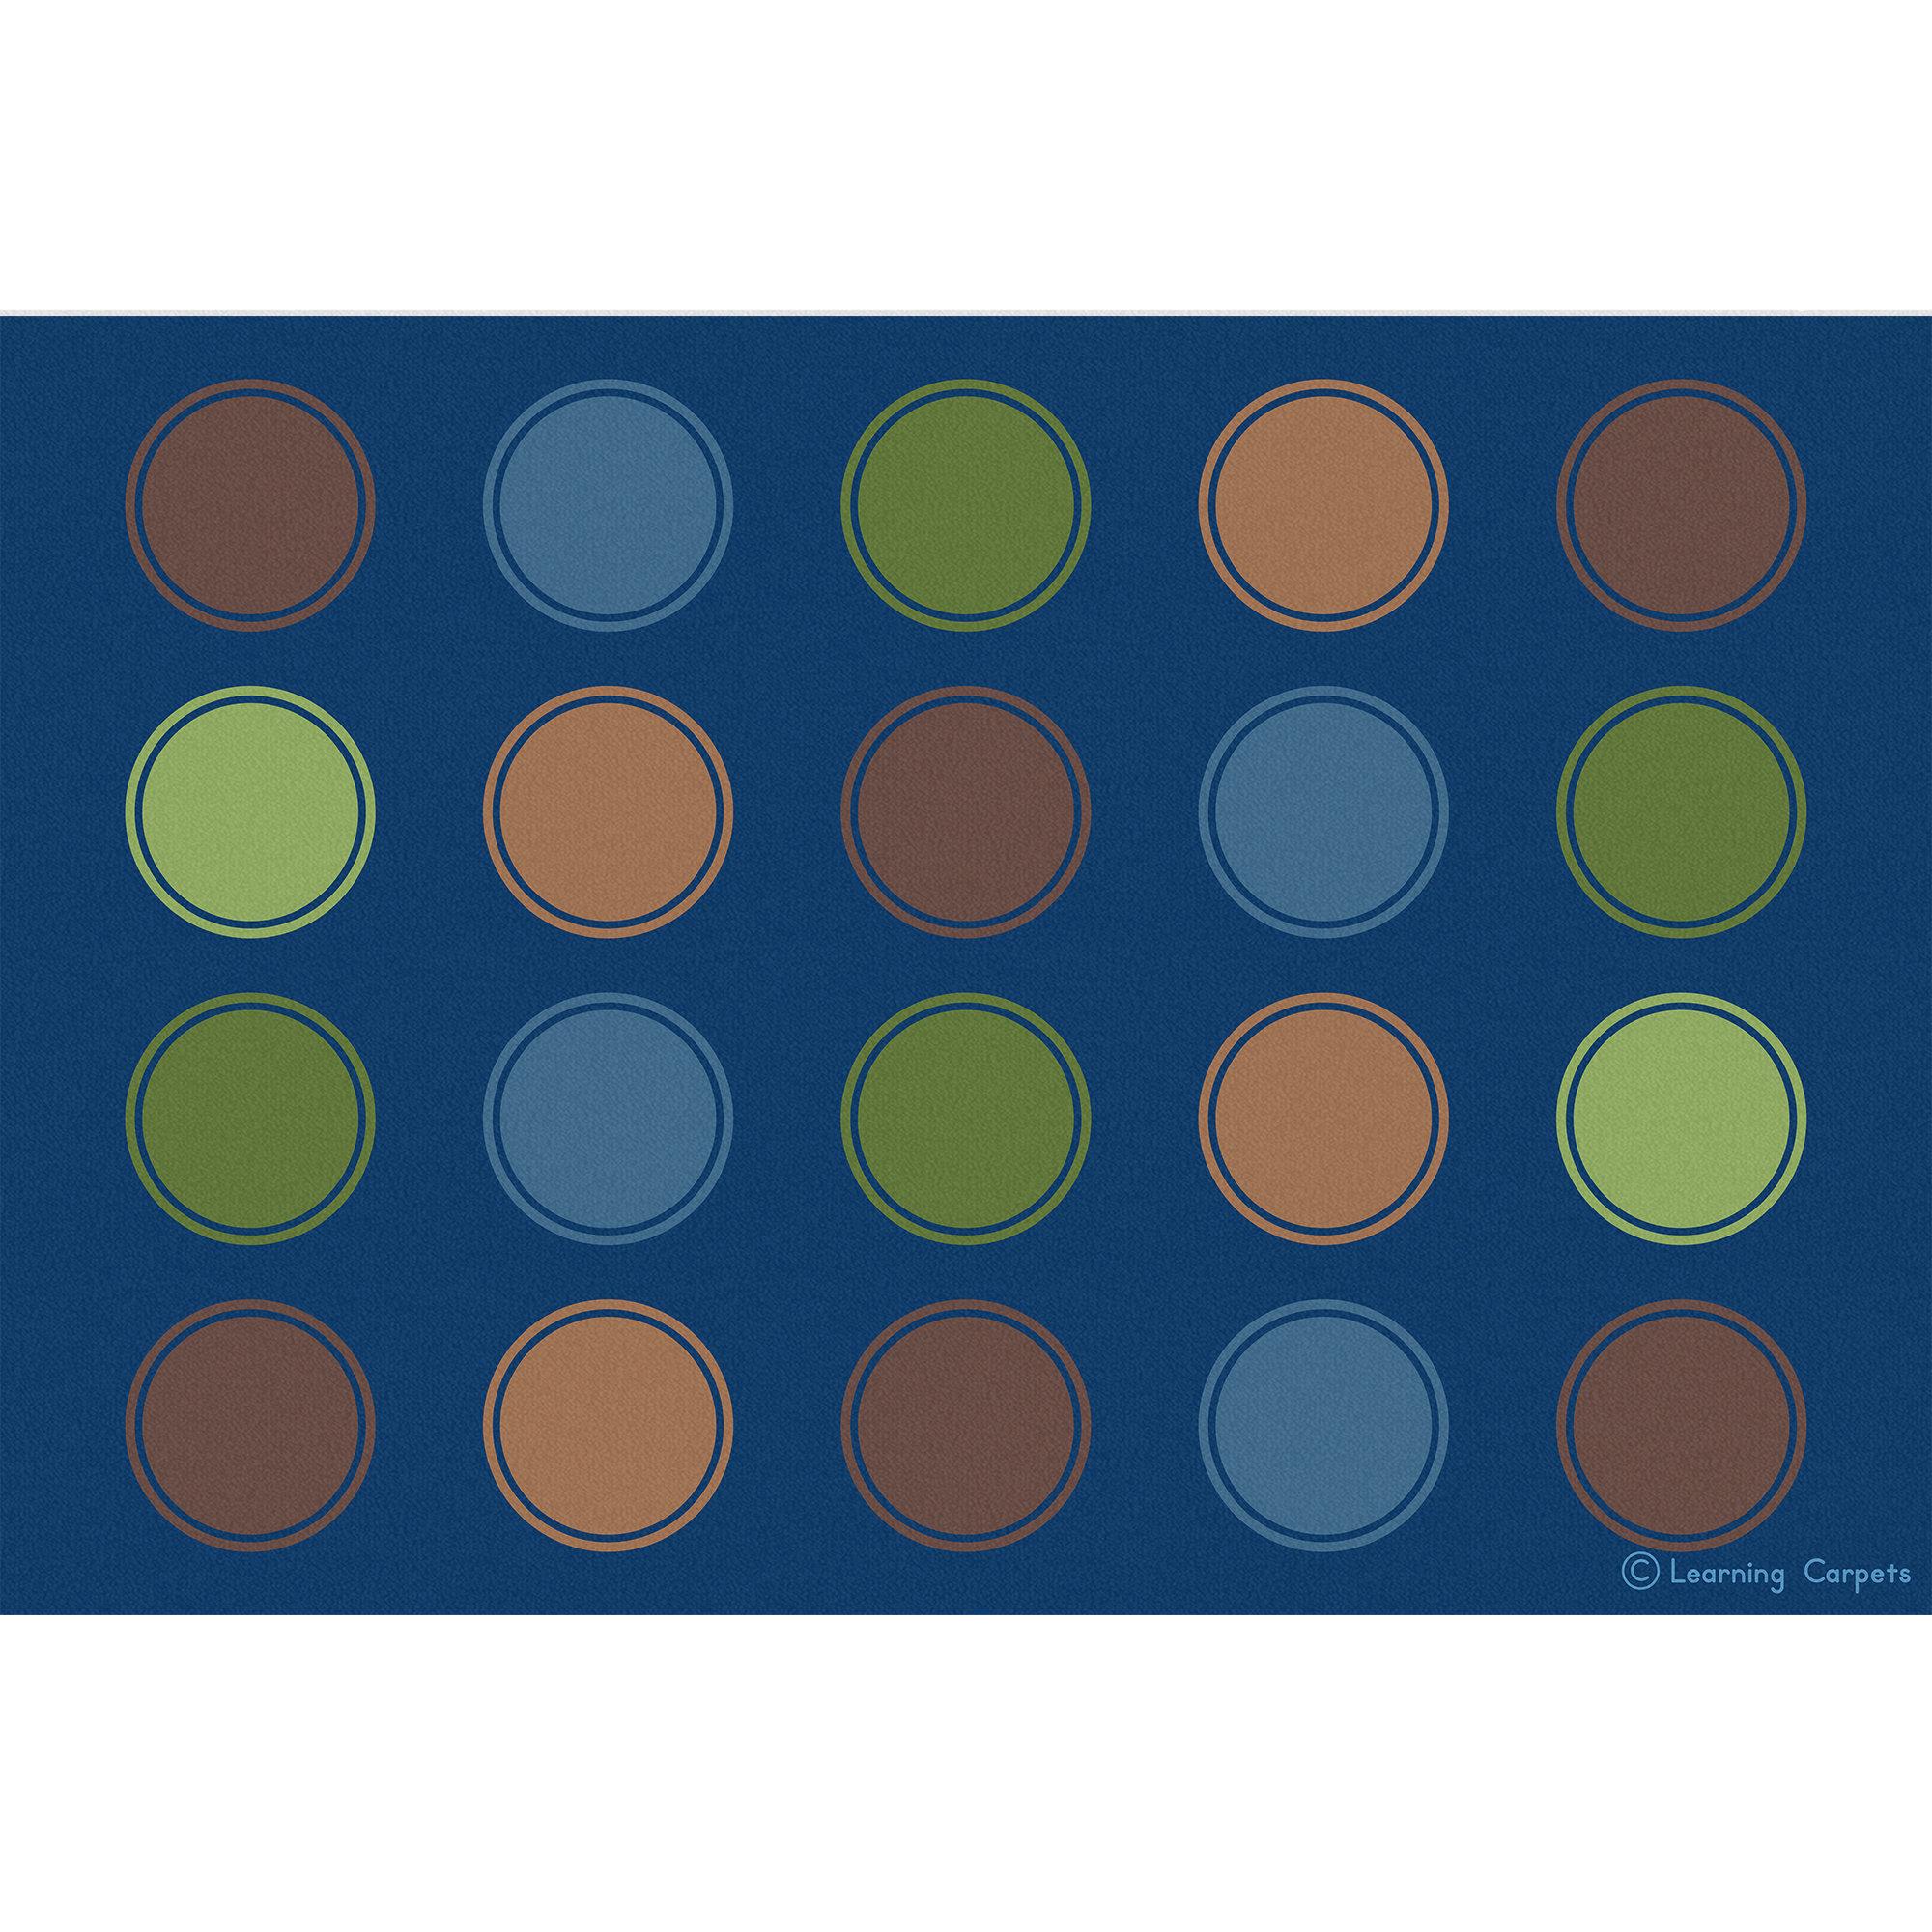 Learning Carpets Polka Dots Flatweave Blue Green Orange Area Rug Wayfair